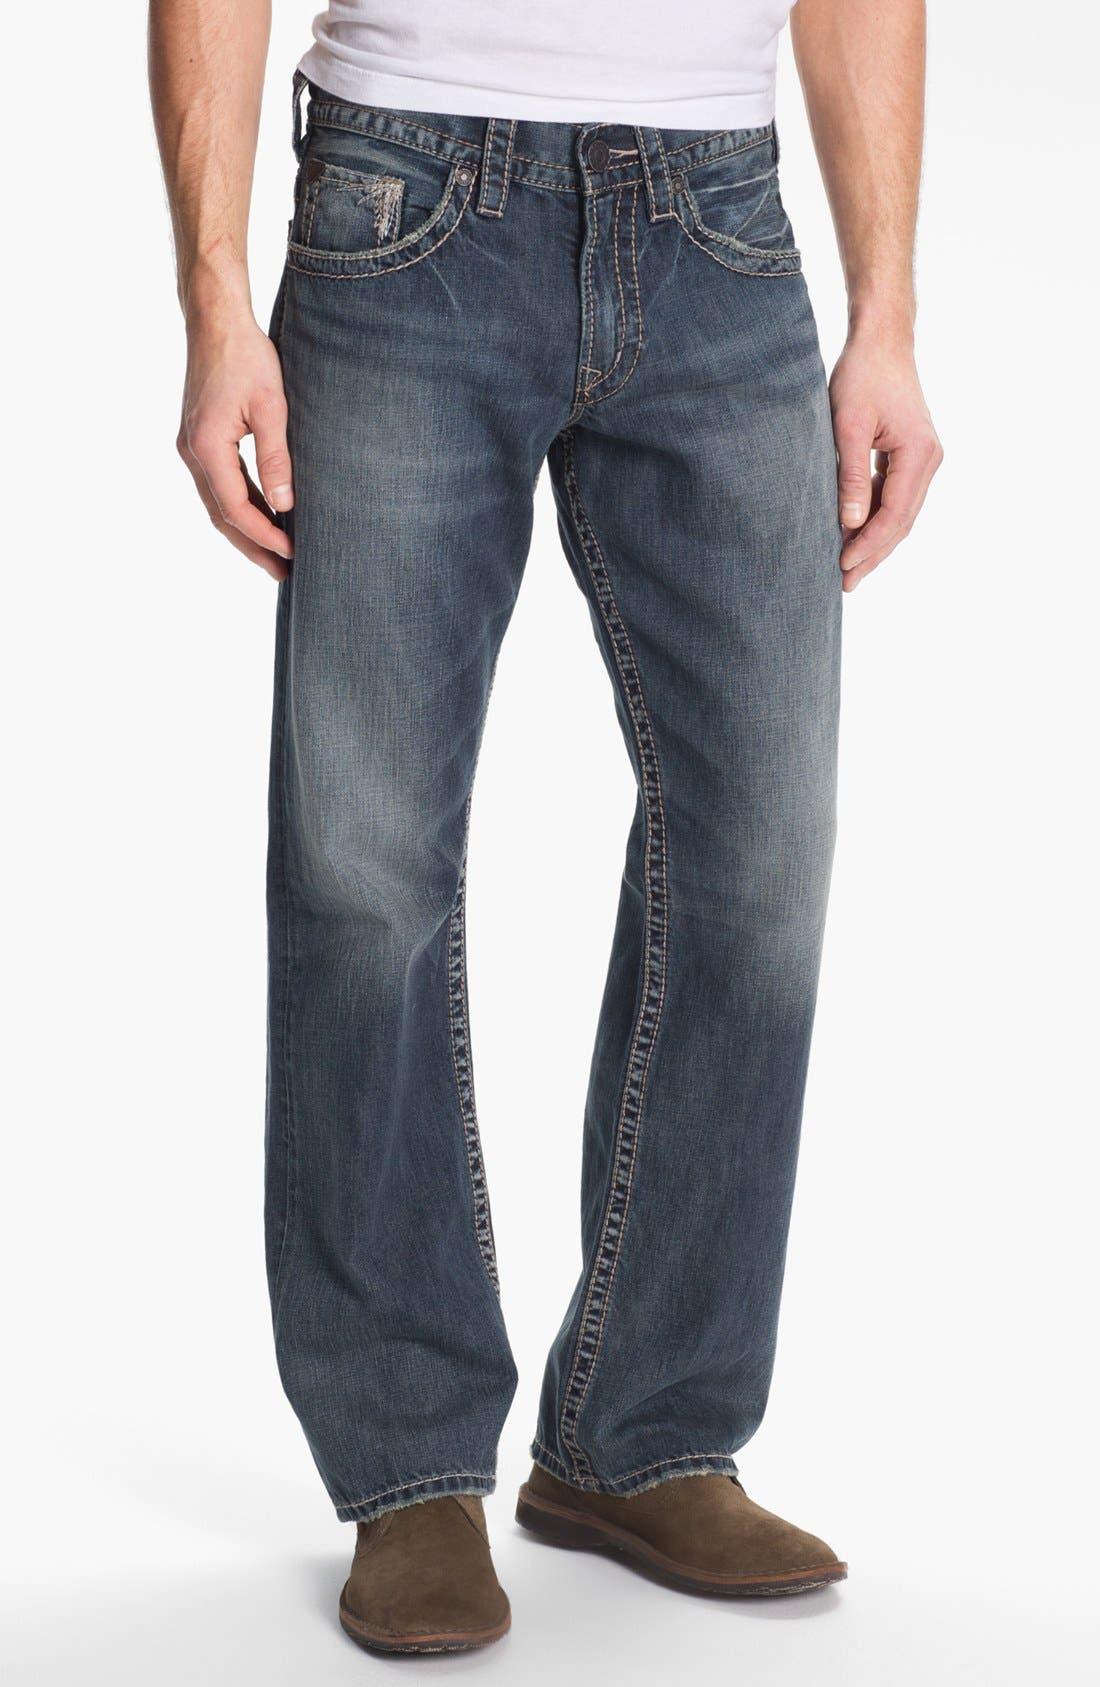 Alternate Image 2  - Silver Jeans Co. 'Gordie' Bootcut Jeans (Indigo)